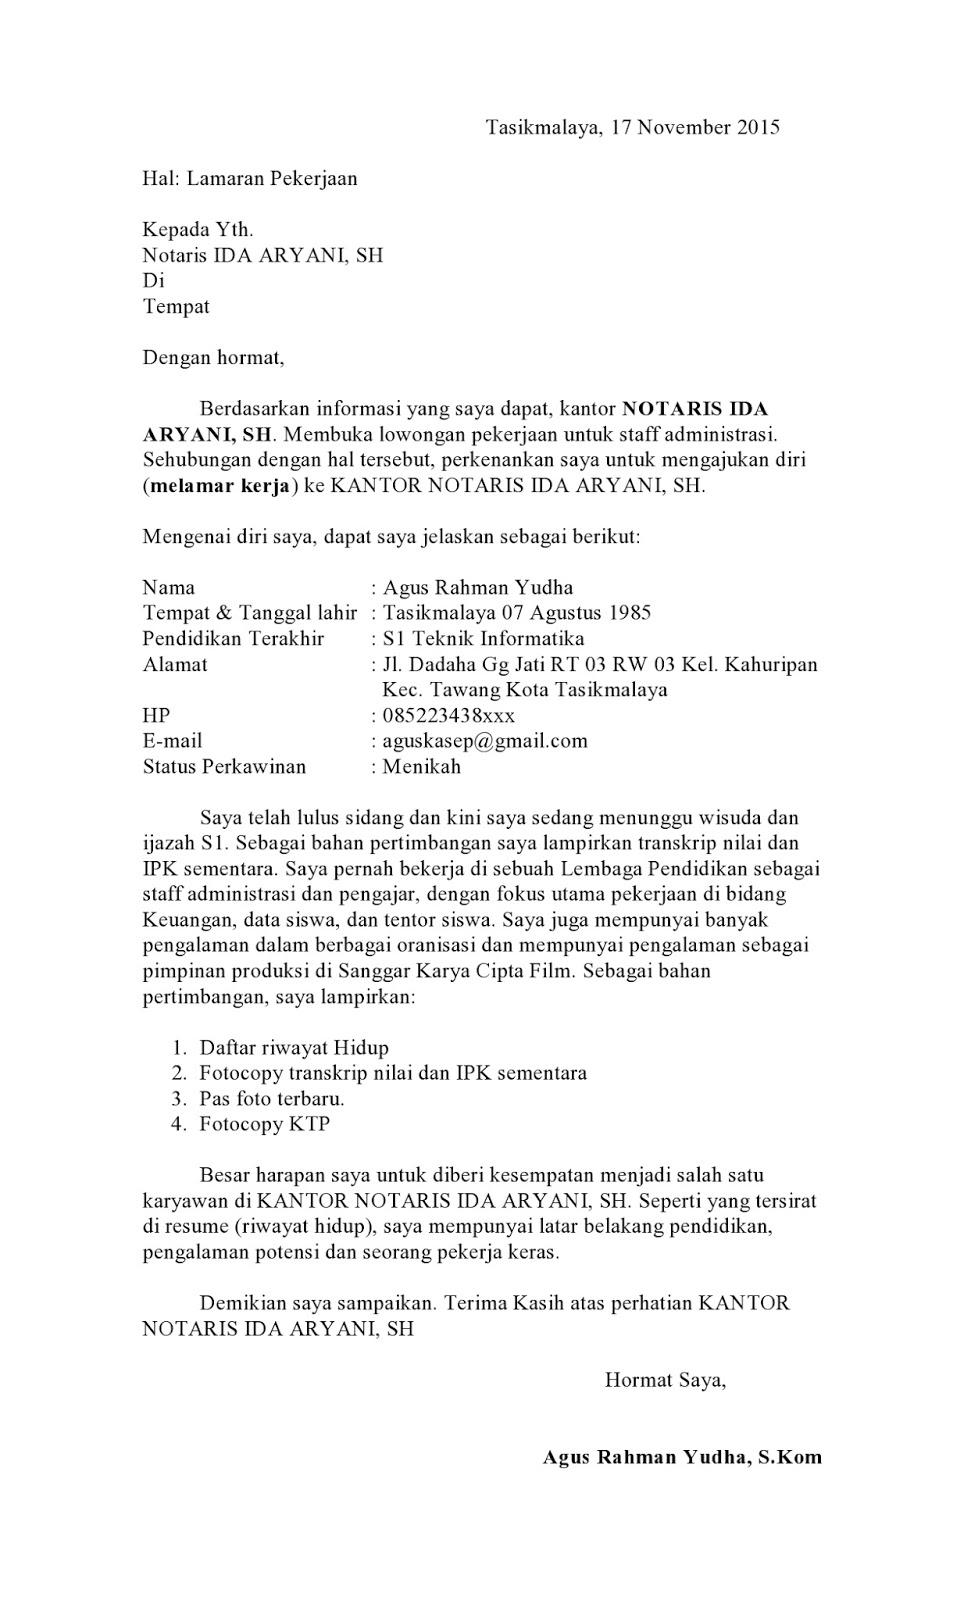 contoh surat lamaran kerja di ppat, contoh surat pengalaman kerja di kantor notaris, cara melamar kerja di kantor notaris, contoh surat lamaran magang di kantor notaris, lowongan kerja kantor notaris, contoh surat keterangan magang di kantor notaris, contoh surat magang notaris, contoh surat lamaran kerja di kantor pengacara, susan-jobs.blogspot.com